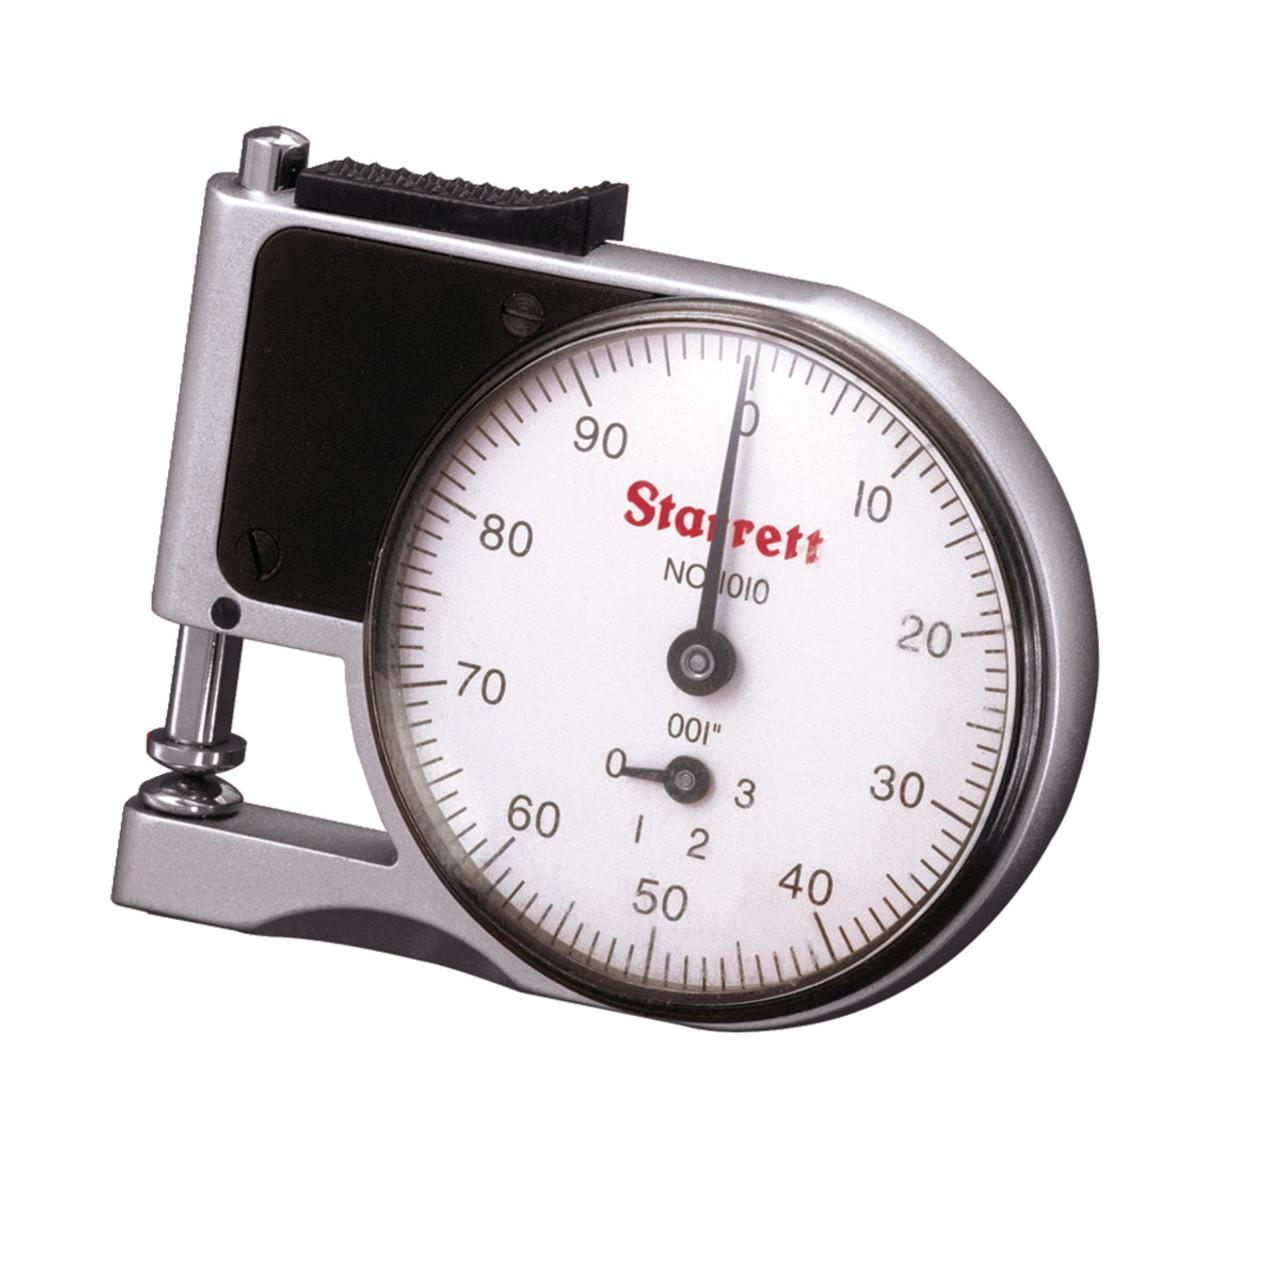 hight resolution of  1010z edp 53114 dial indicator pocket gage 0 375 mercado regal